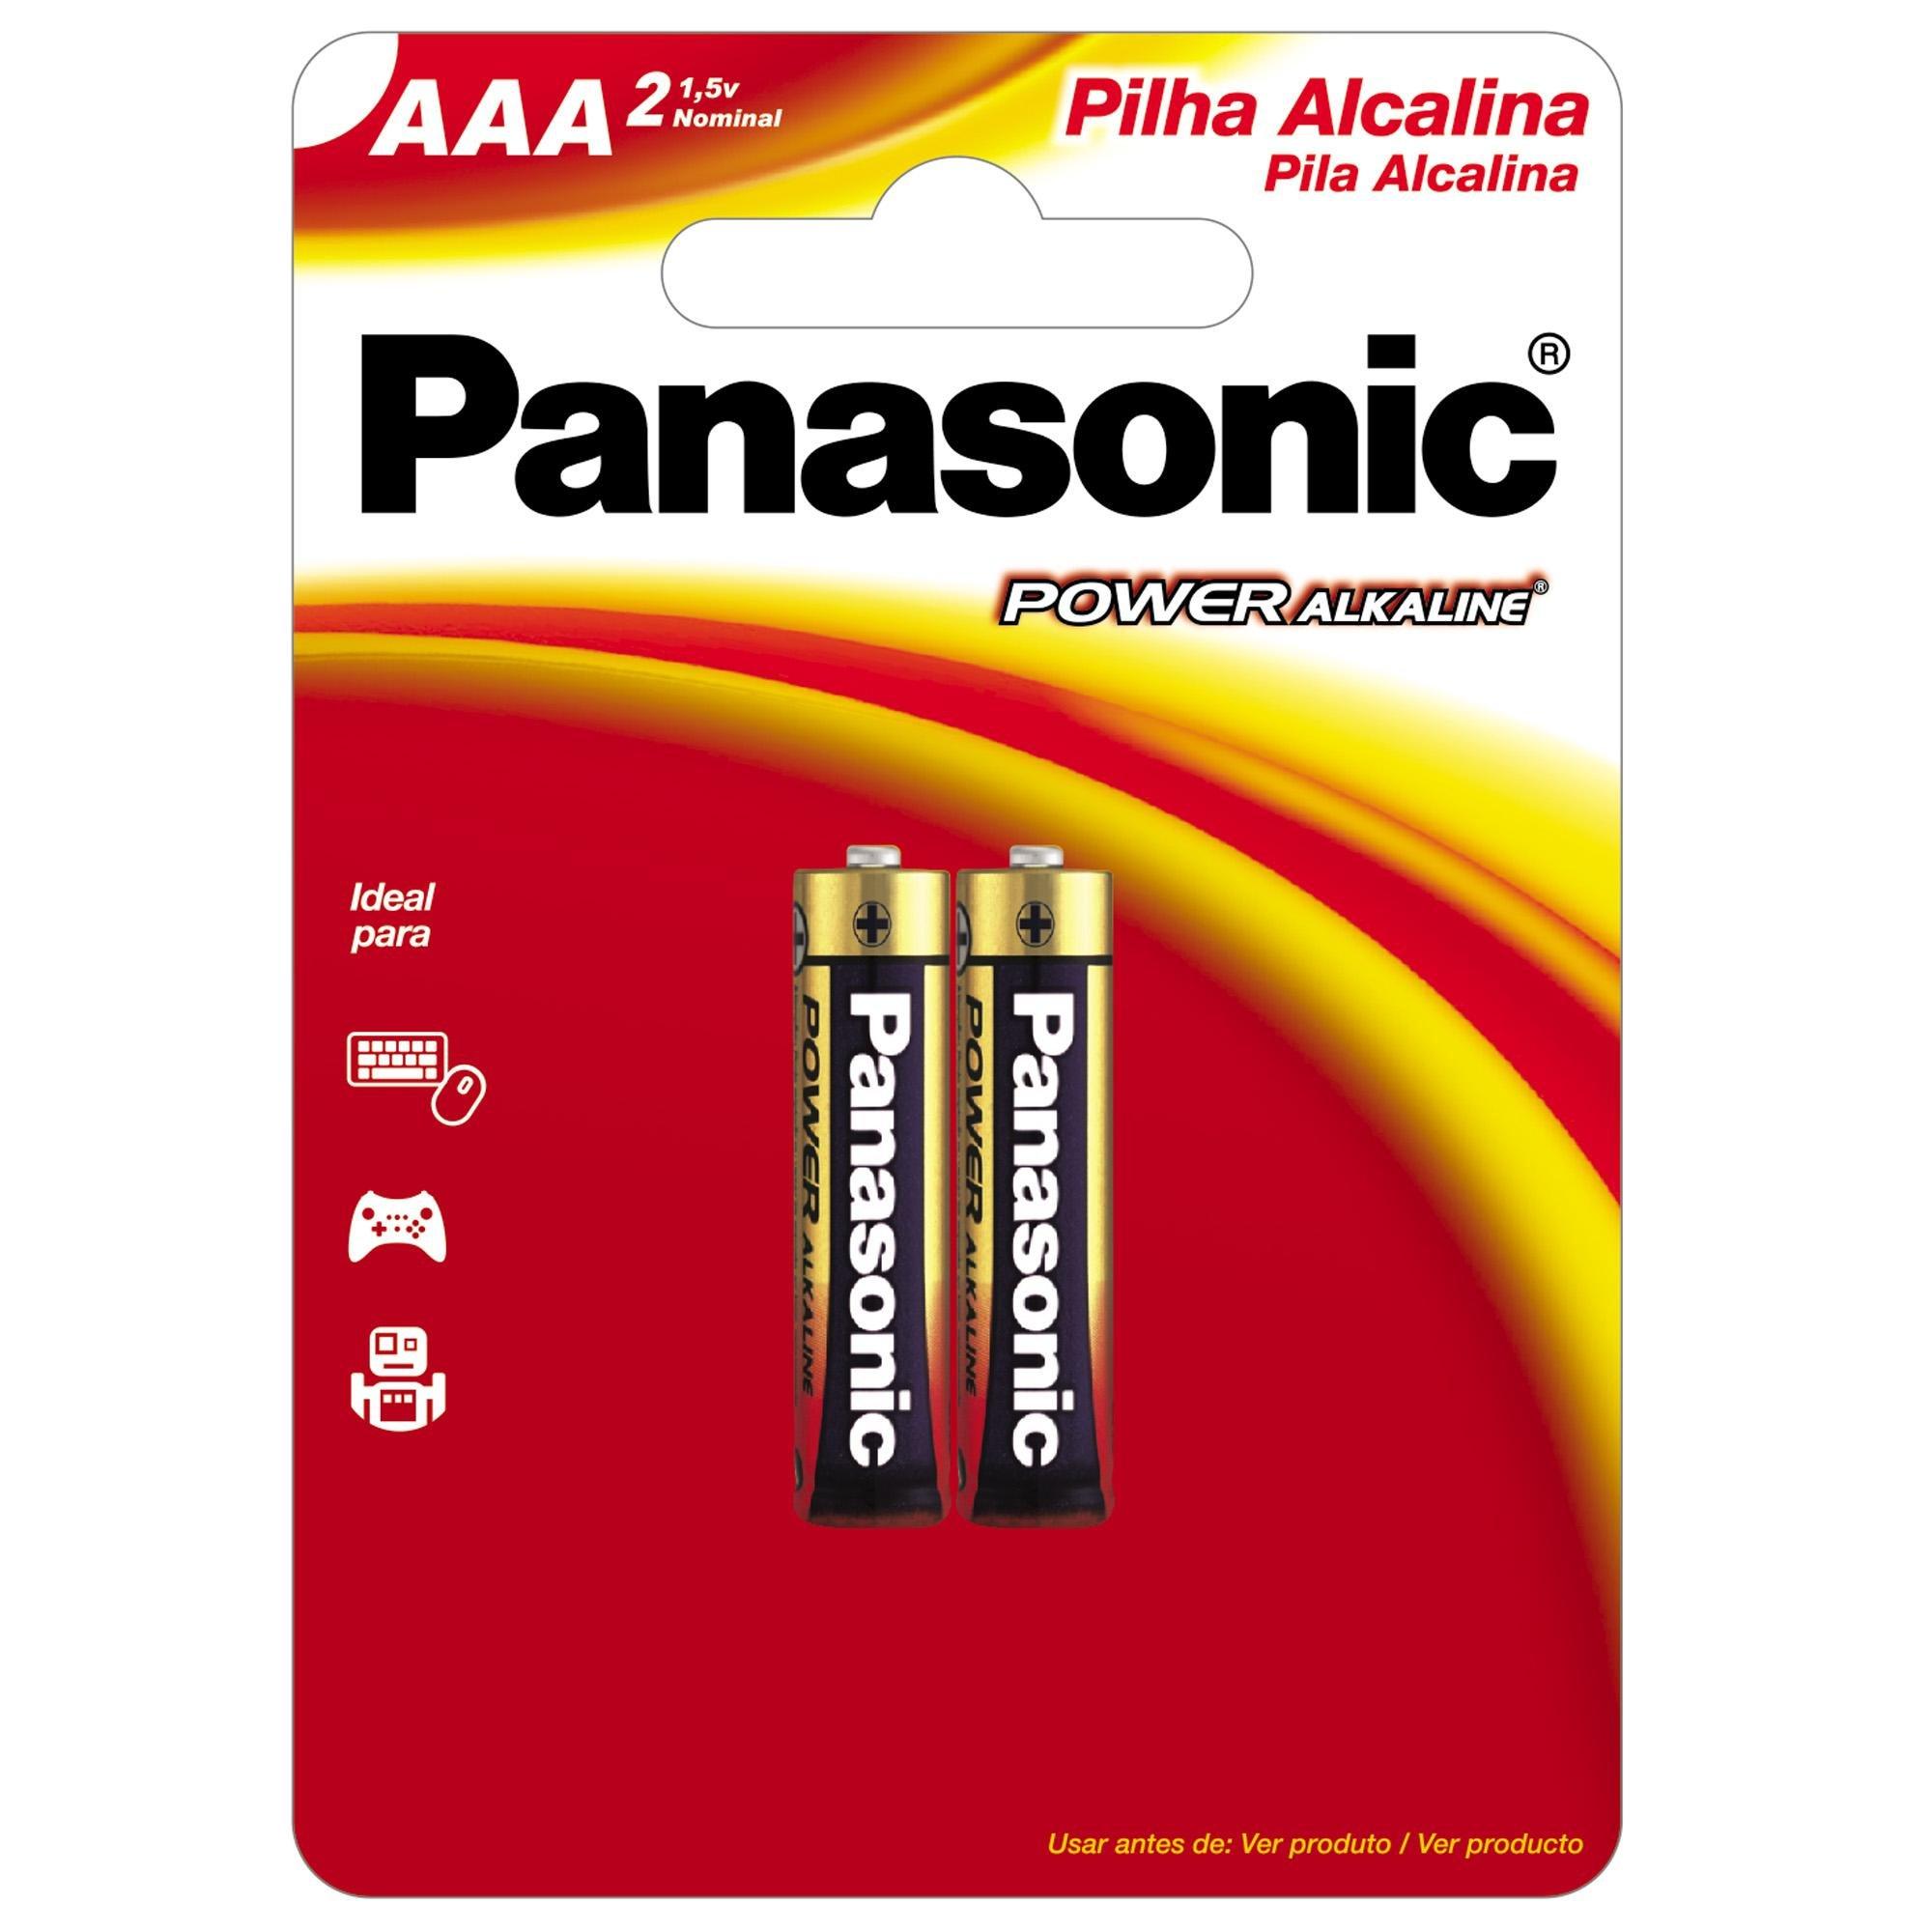 Pilha Alcalina AAA 1,5V LR03XAB/2B1 PANASONIC (Cartela com 2